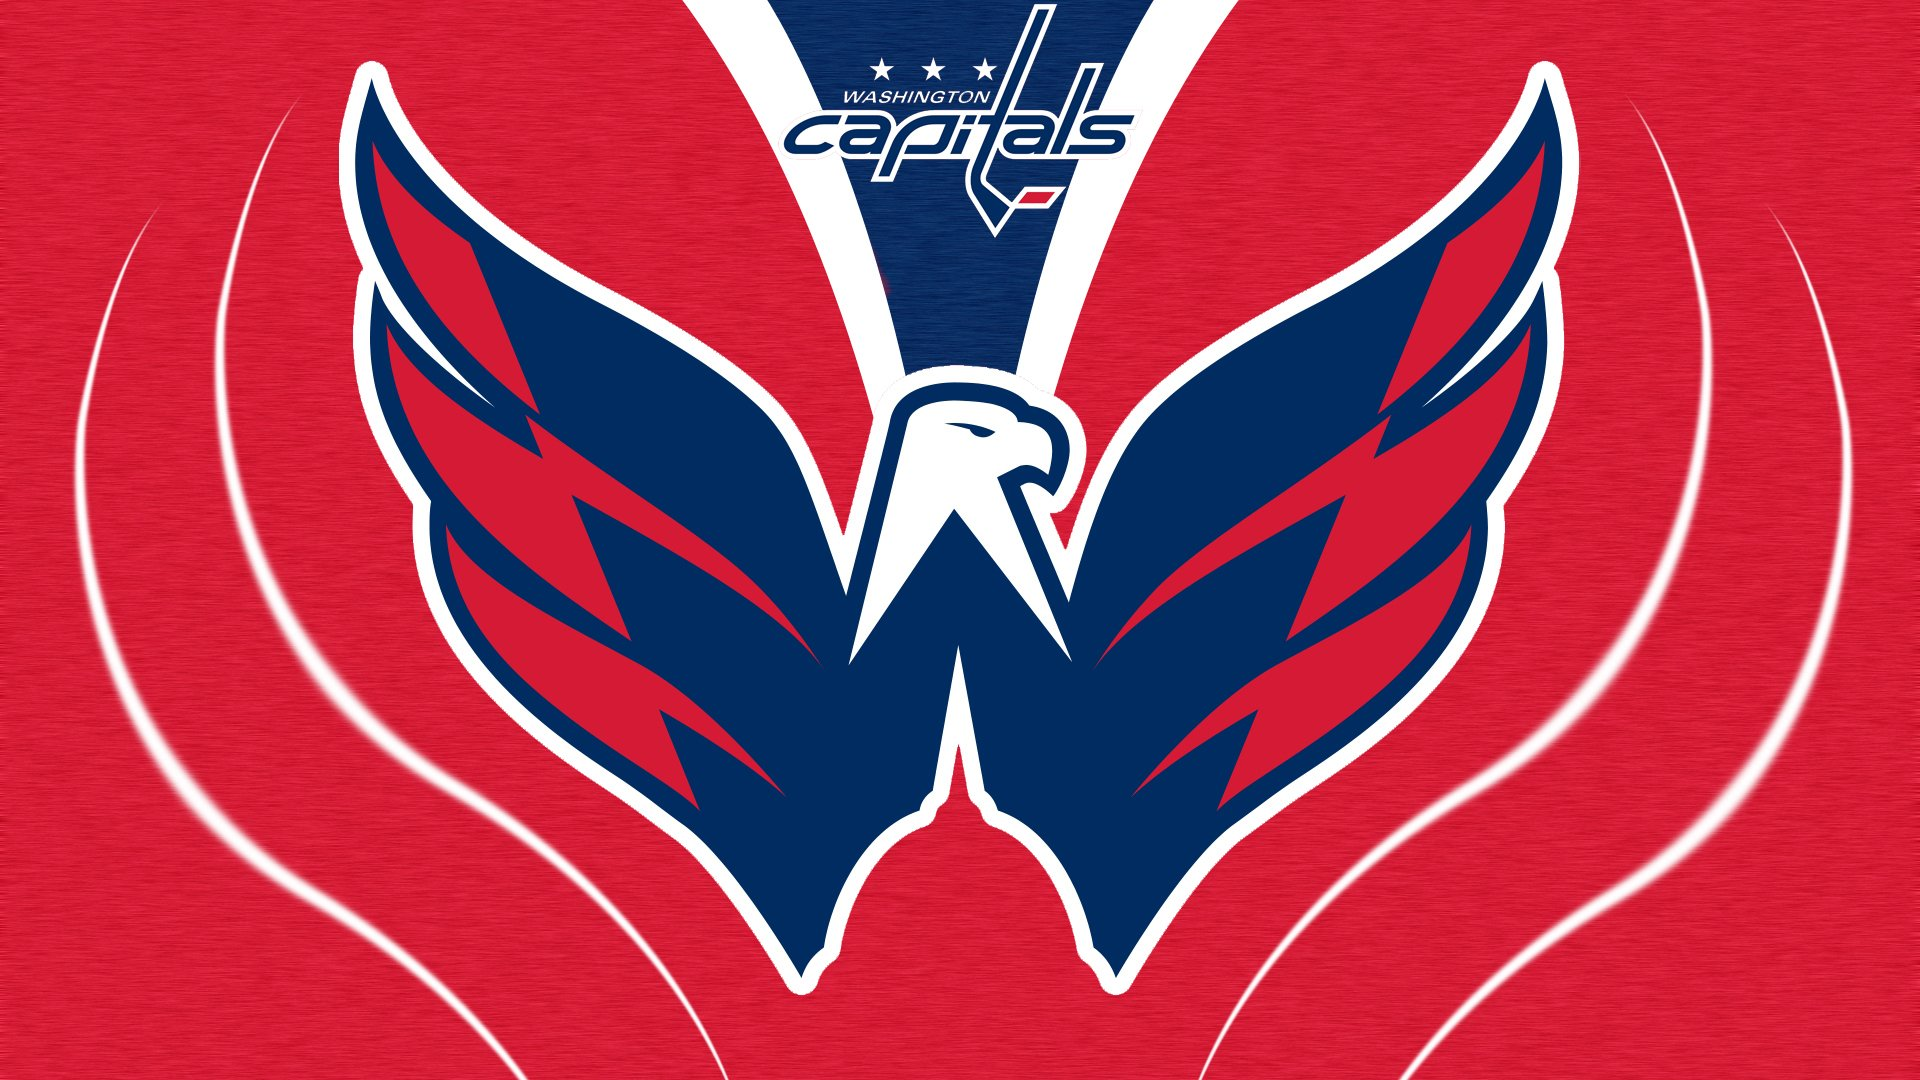 WASHINGTON CAPITALS hockey nhl 52 wallpaper 1920x1080 359694 1920x1080